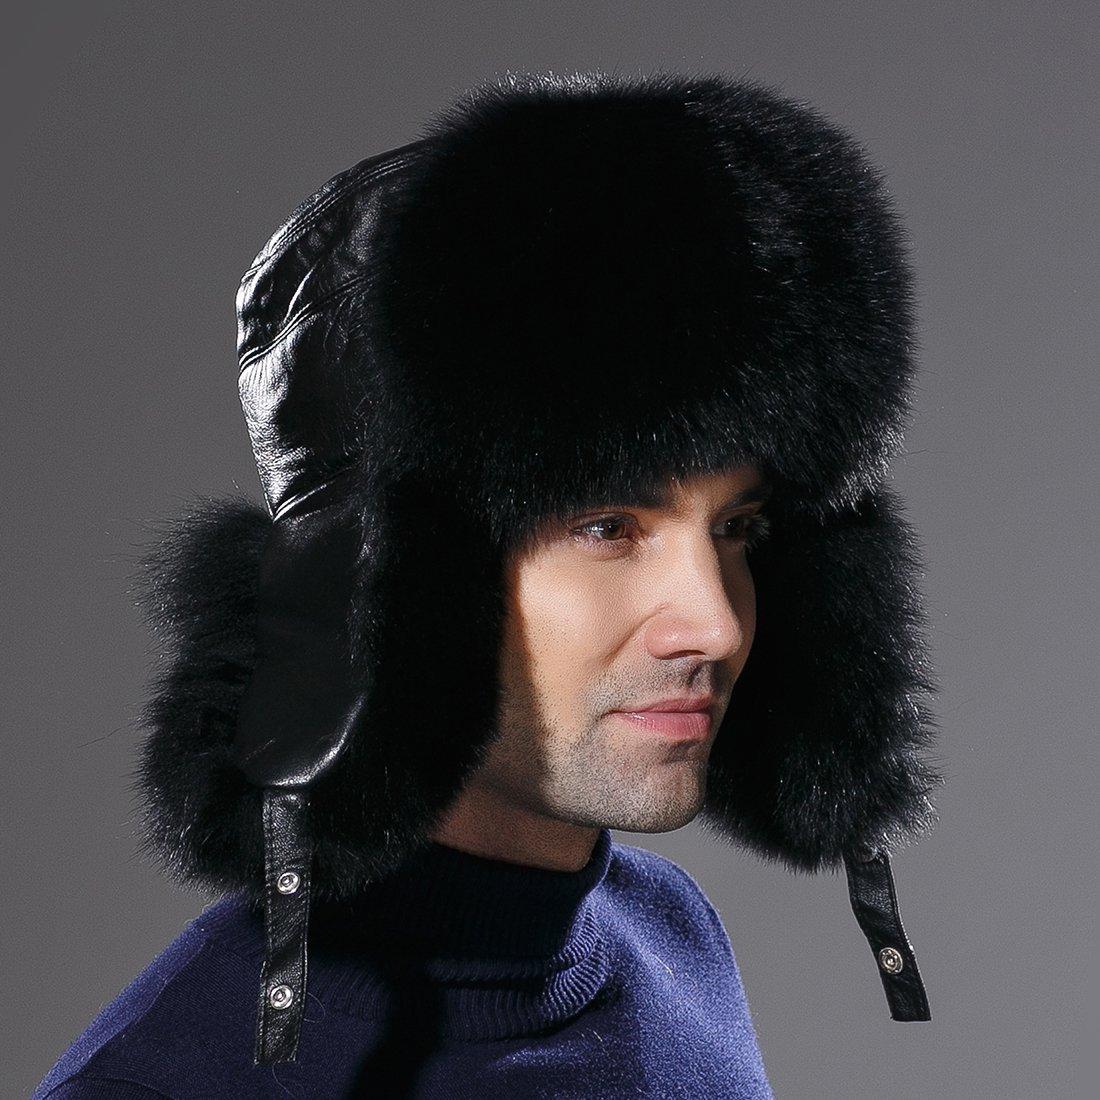 URSFUR Winter Russian Fur Hat Mens Real Fox Fur Ushanka Trapper Cap Black by URSFUR (Image #5)